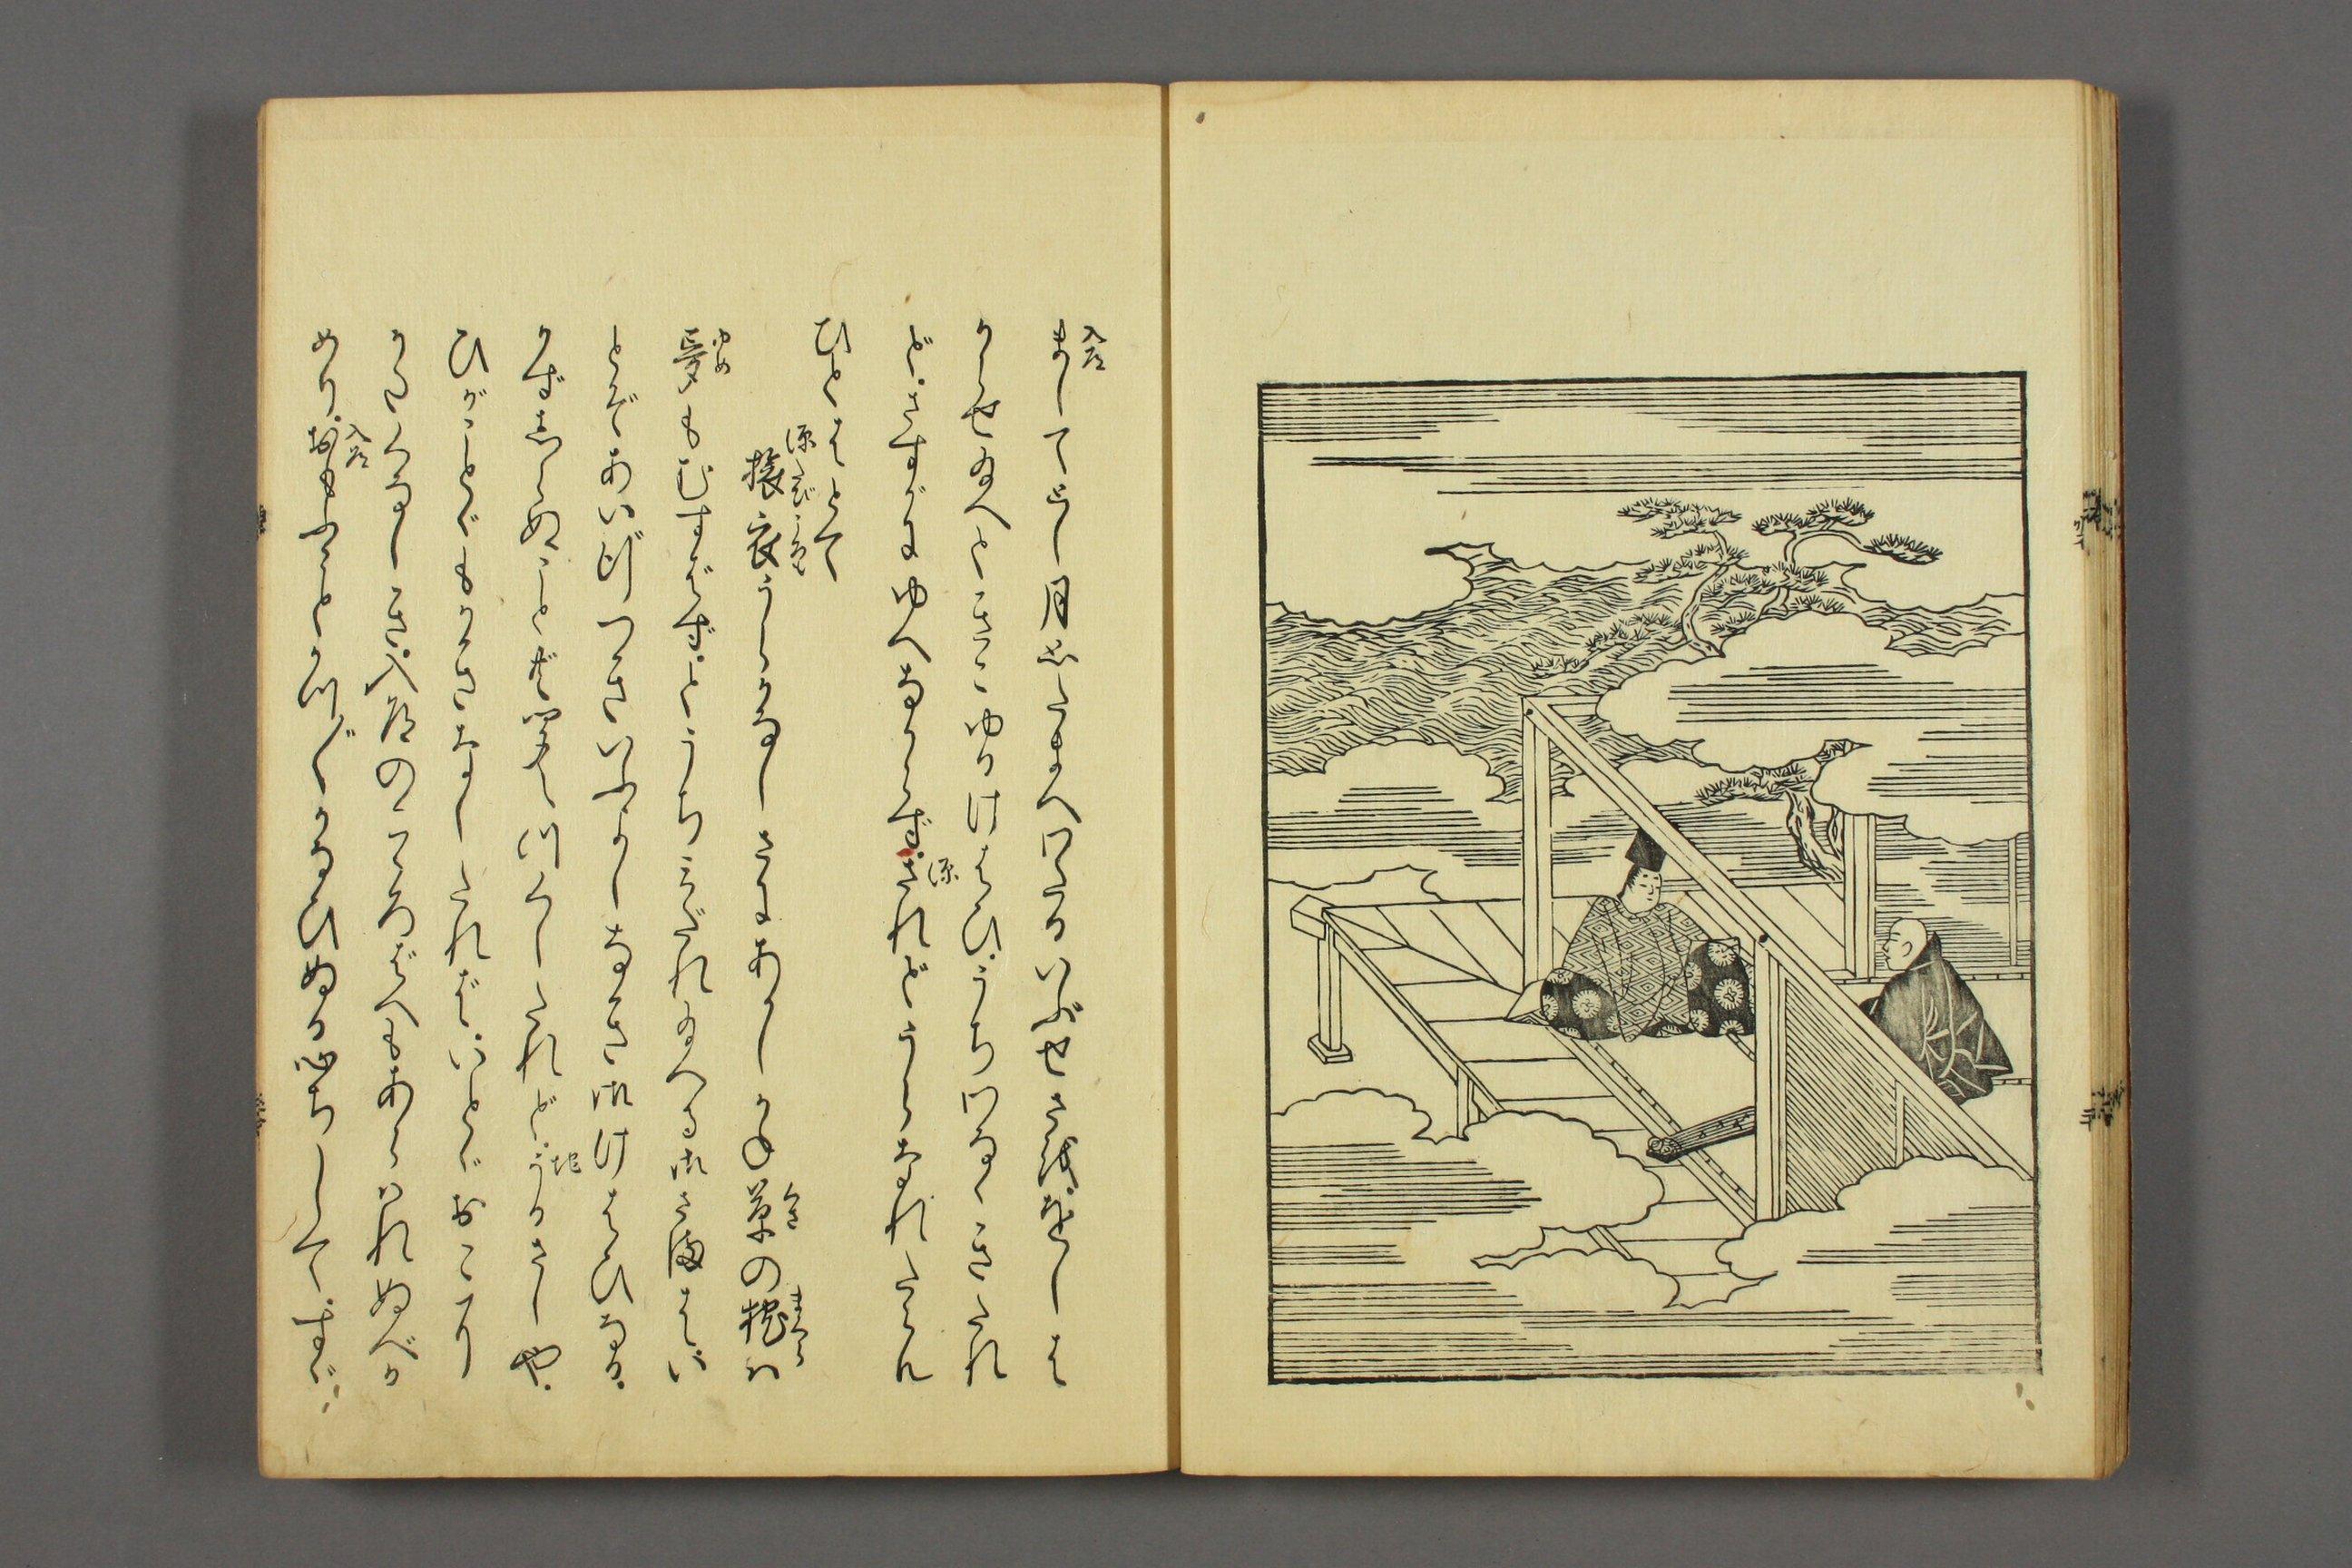 http://archive.wul.waseda.ac.jp/kosho/bunko30/bunko30_a0007/bunko30_a0007_0013/bunko30_a0007_0013_p0022.jpg